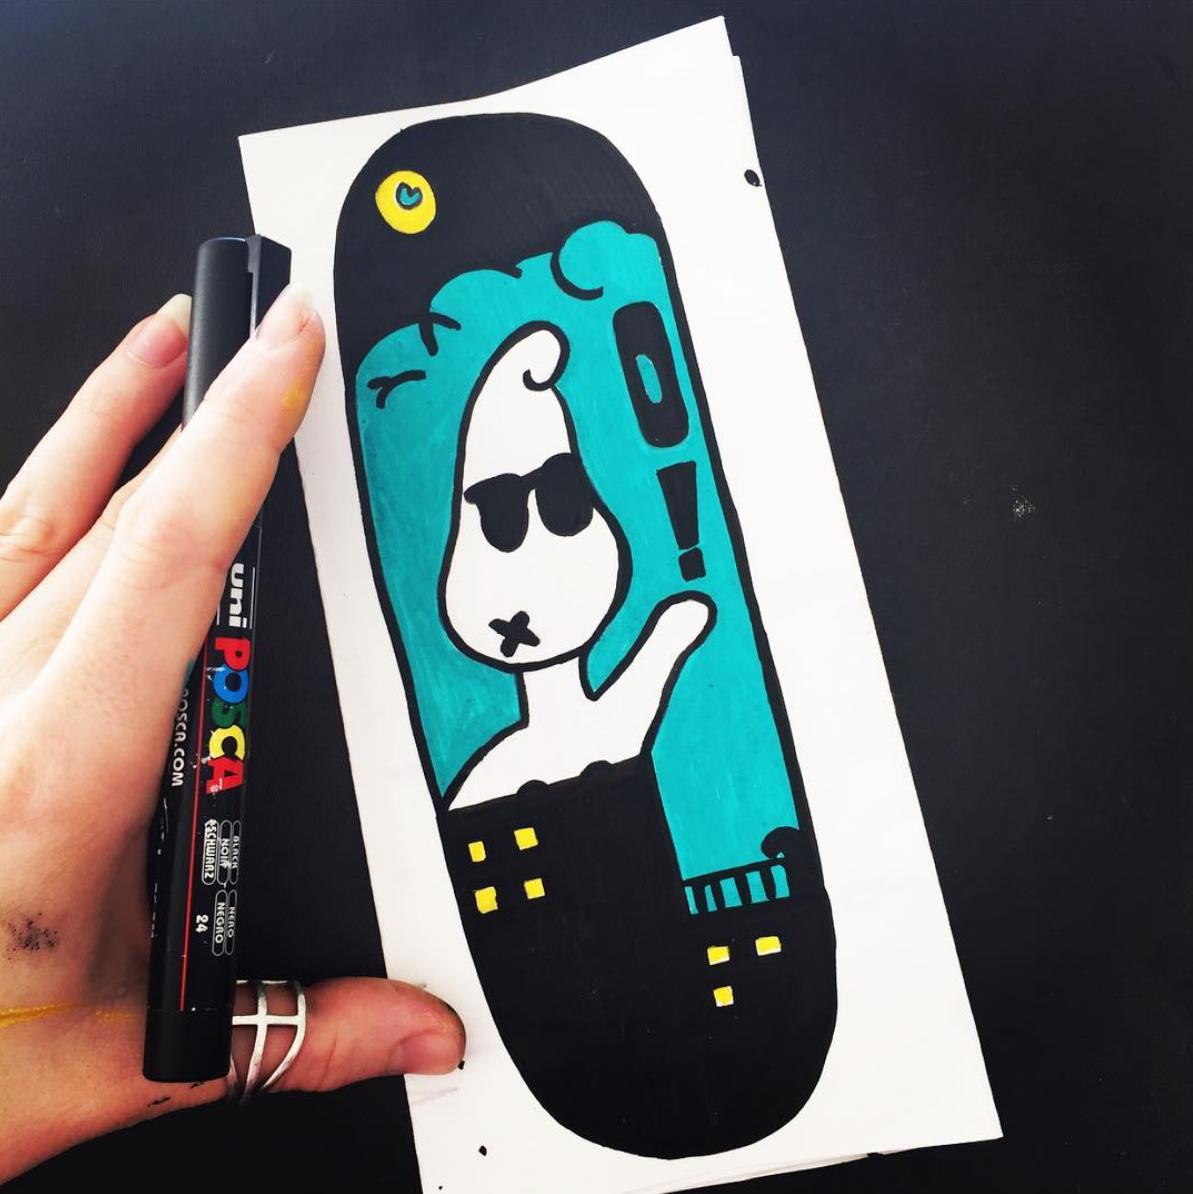 © 2020by OVER THE END - All rights reserved #doodleart #doodleartist #deckart #snowboardart #snowboardartist #shred #sendit #snowboarding #skateboardart #skateboarding #skateboard #skateboardartist #characterart #creatureart #mixedmedia #abstract #abstractart #funkyart #weird #weirdart #unusualart #art #surrealism #posca #doodle #brightcolours #neonart #unfineart #colourfulart #surrealism #psychedelicart